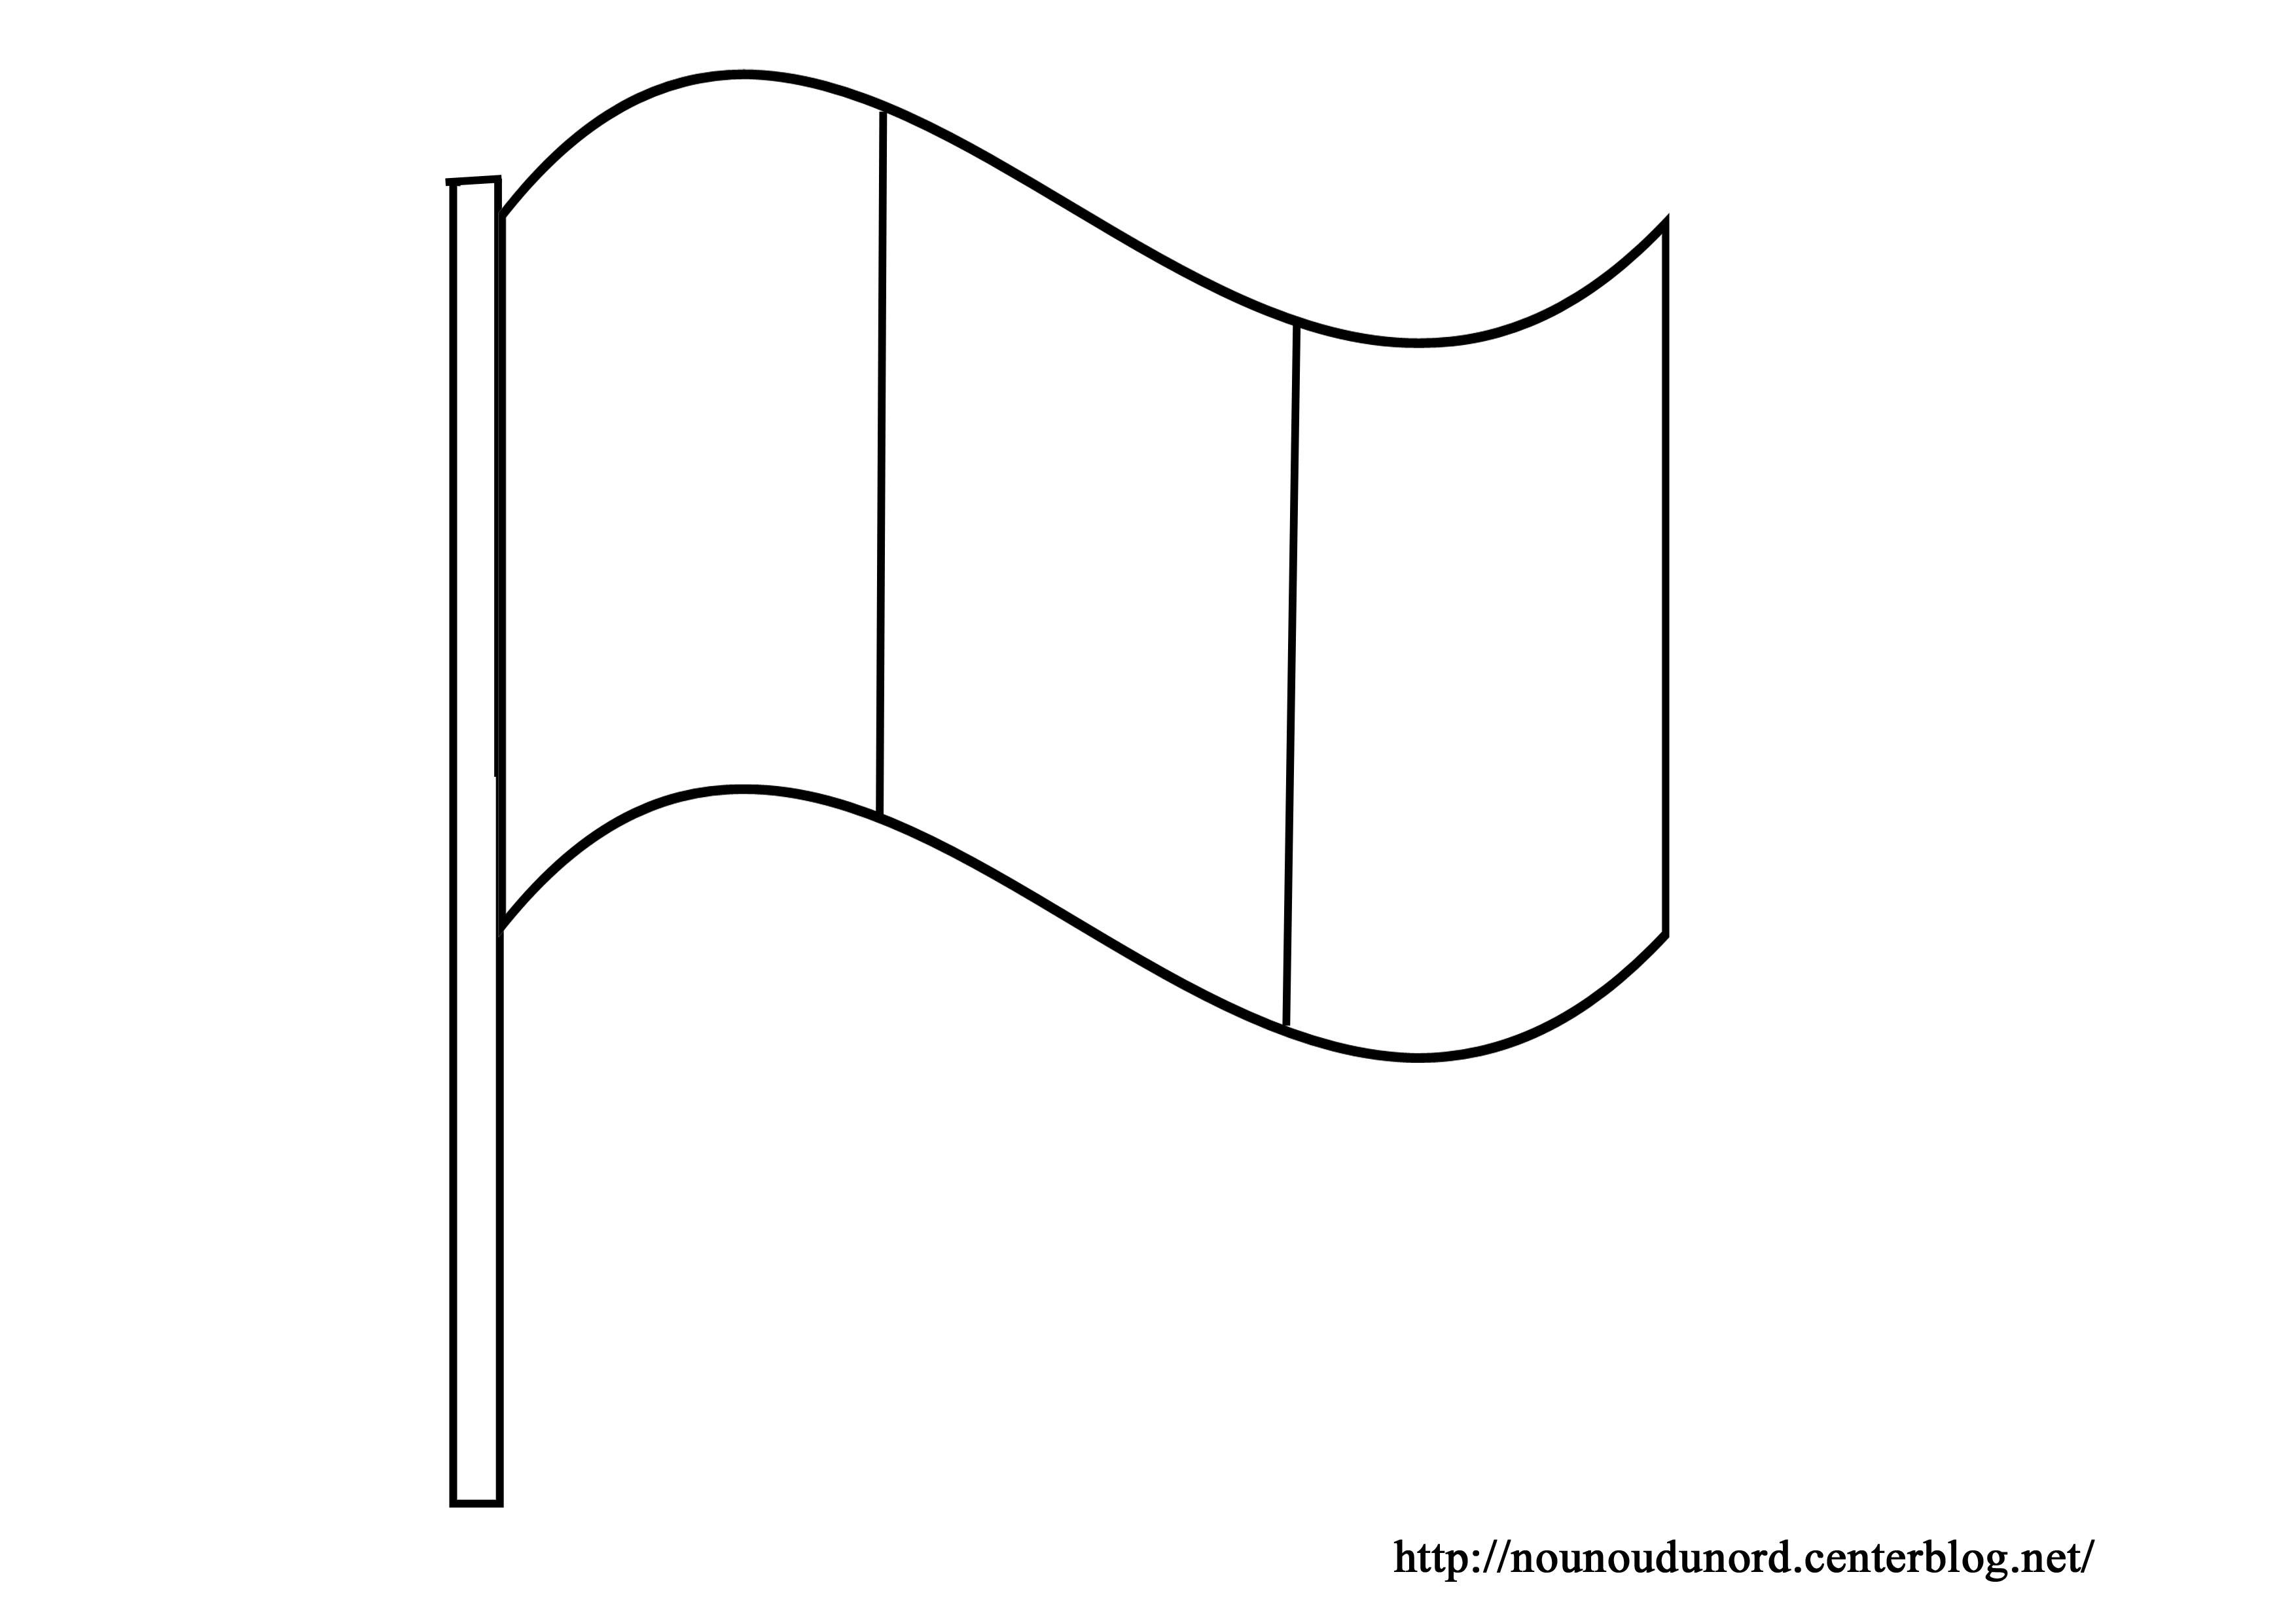 Coloriage dessiner drapeau angleterre - Drapeau angleterre coloriage ...